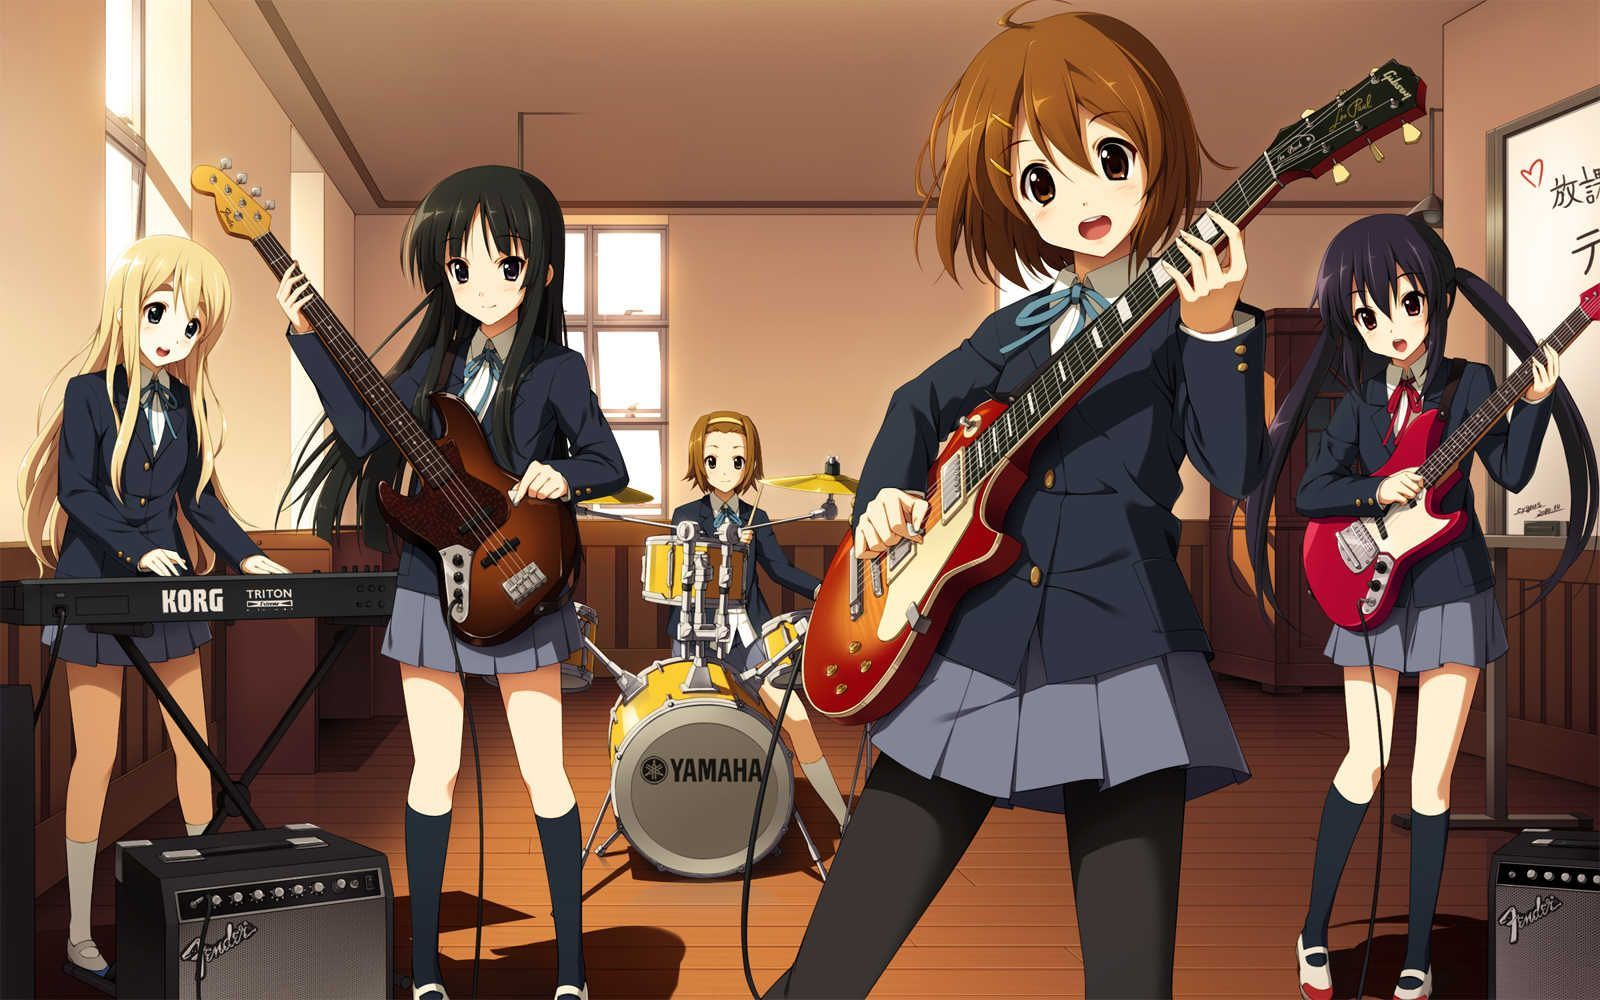 anime music images k - photo #14